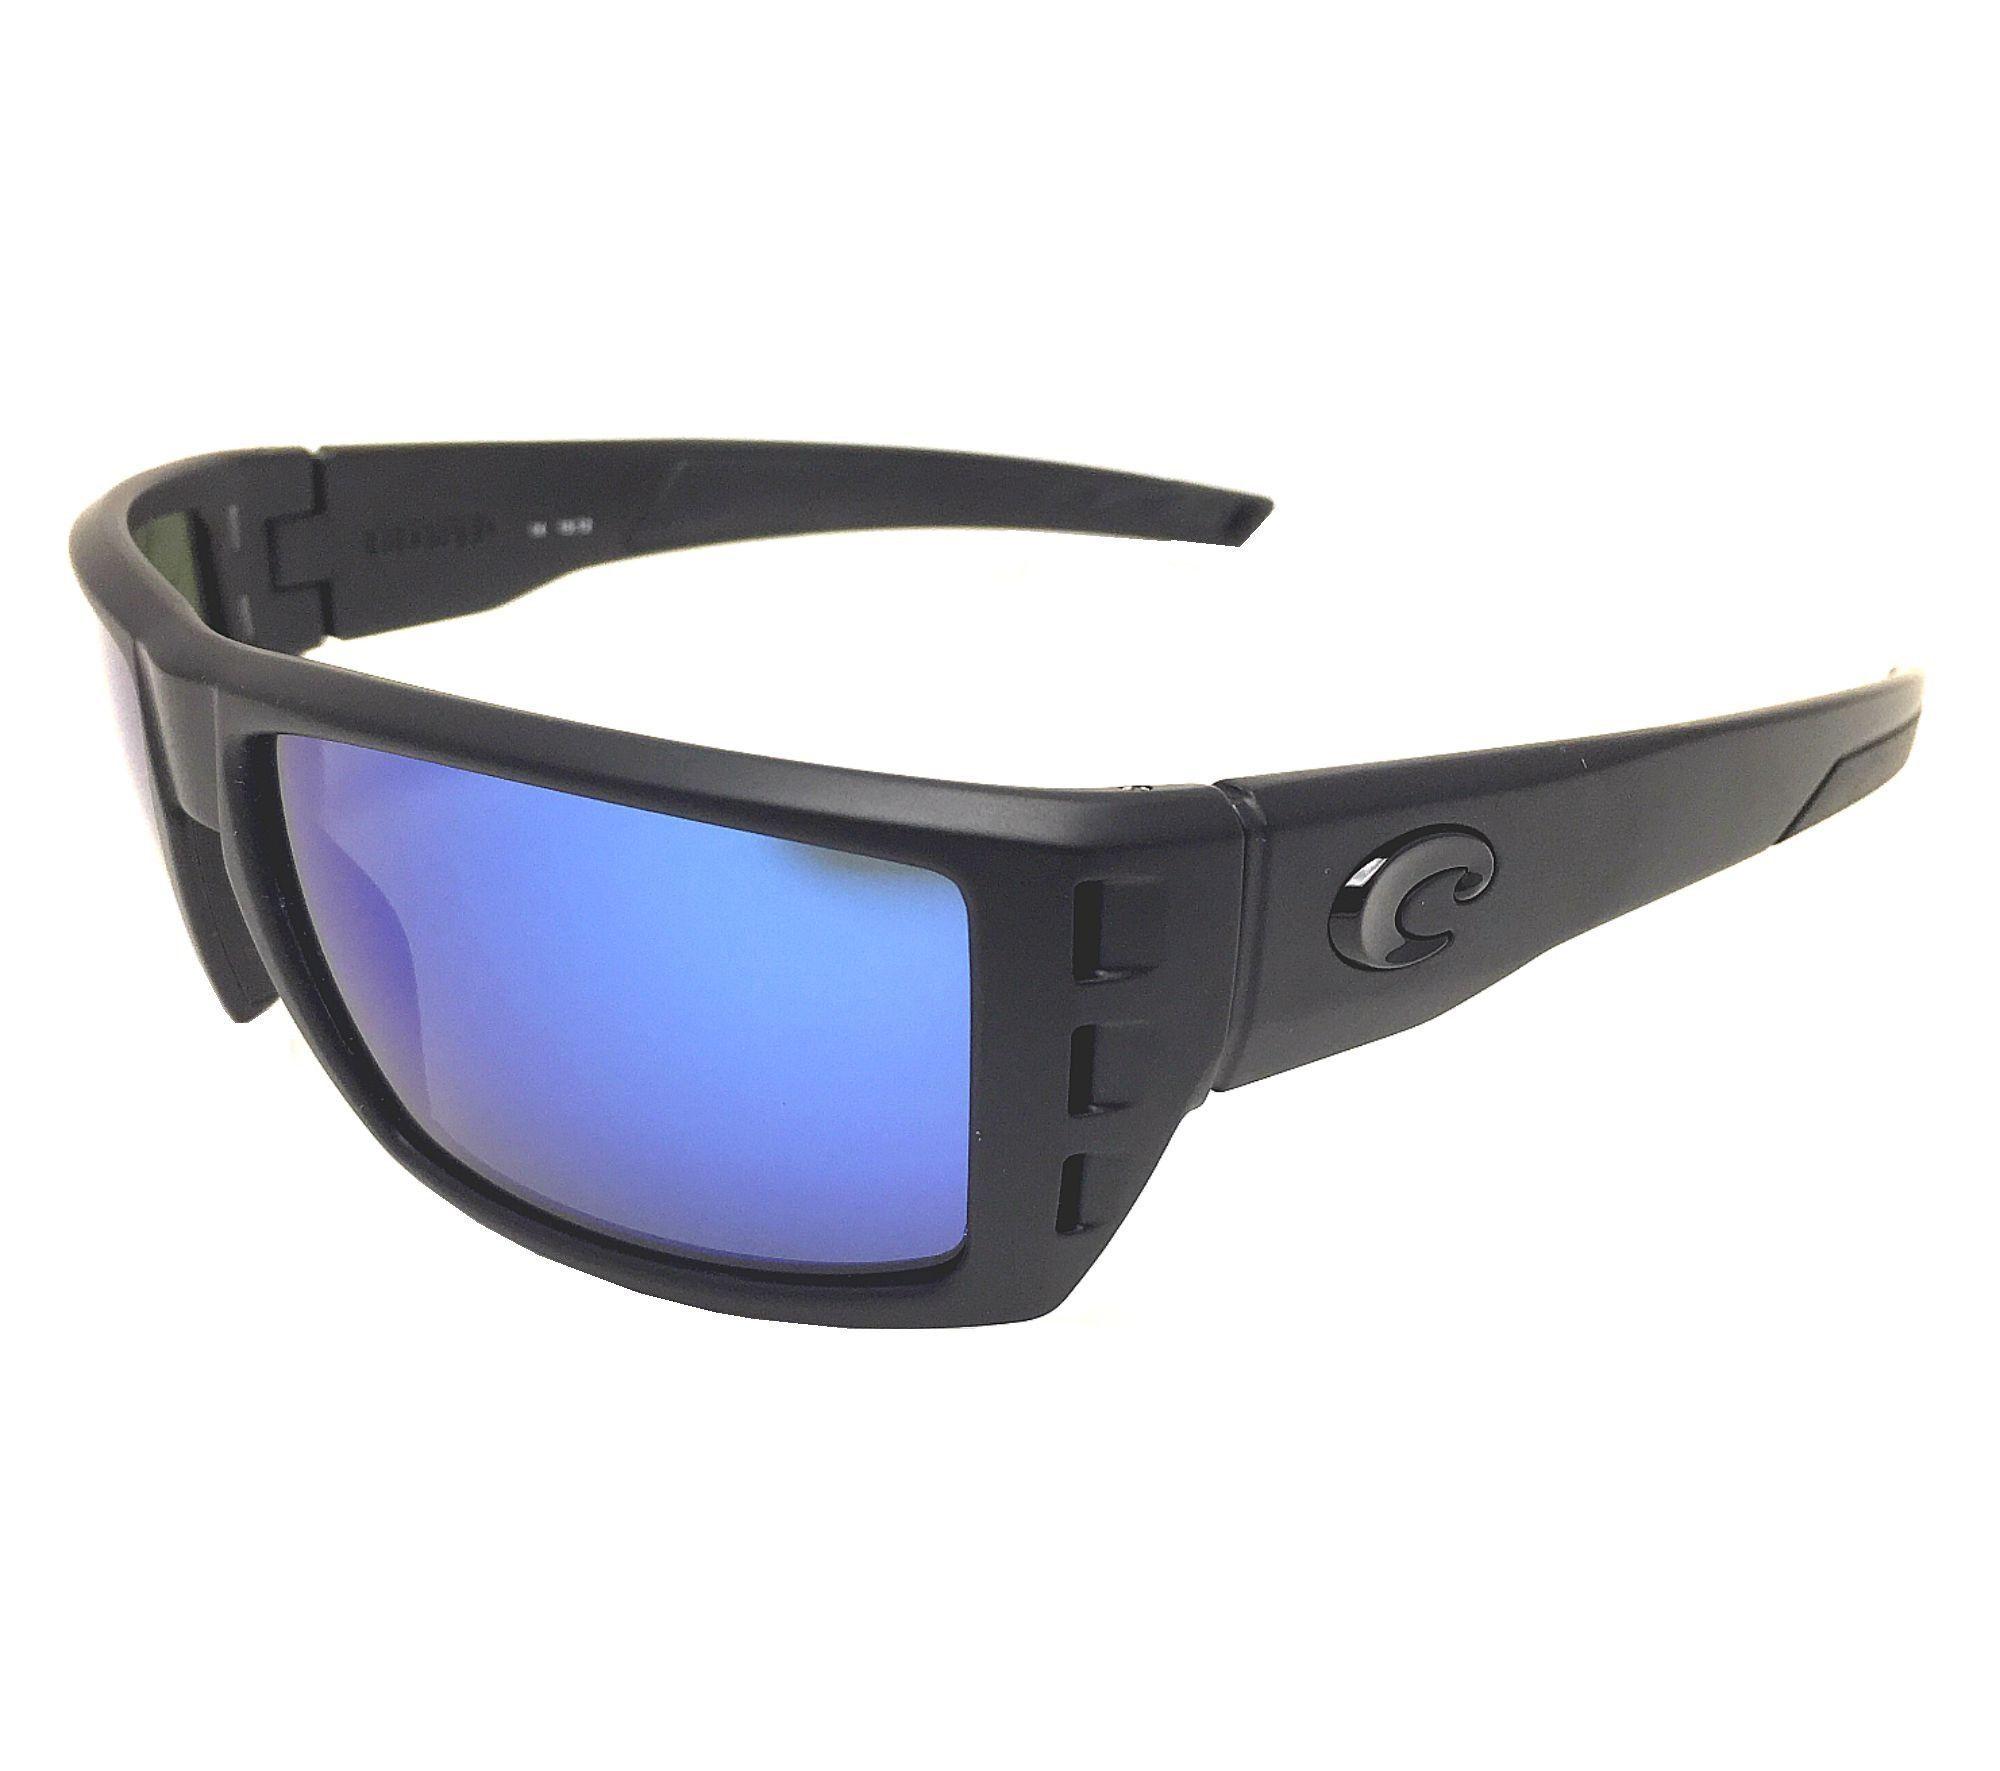 17fc9eca79 Costa Del Mar Rafael 580G Blackout Blue Mirror Polarized Sunglasses ...